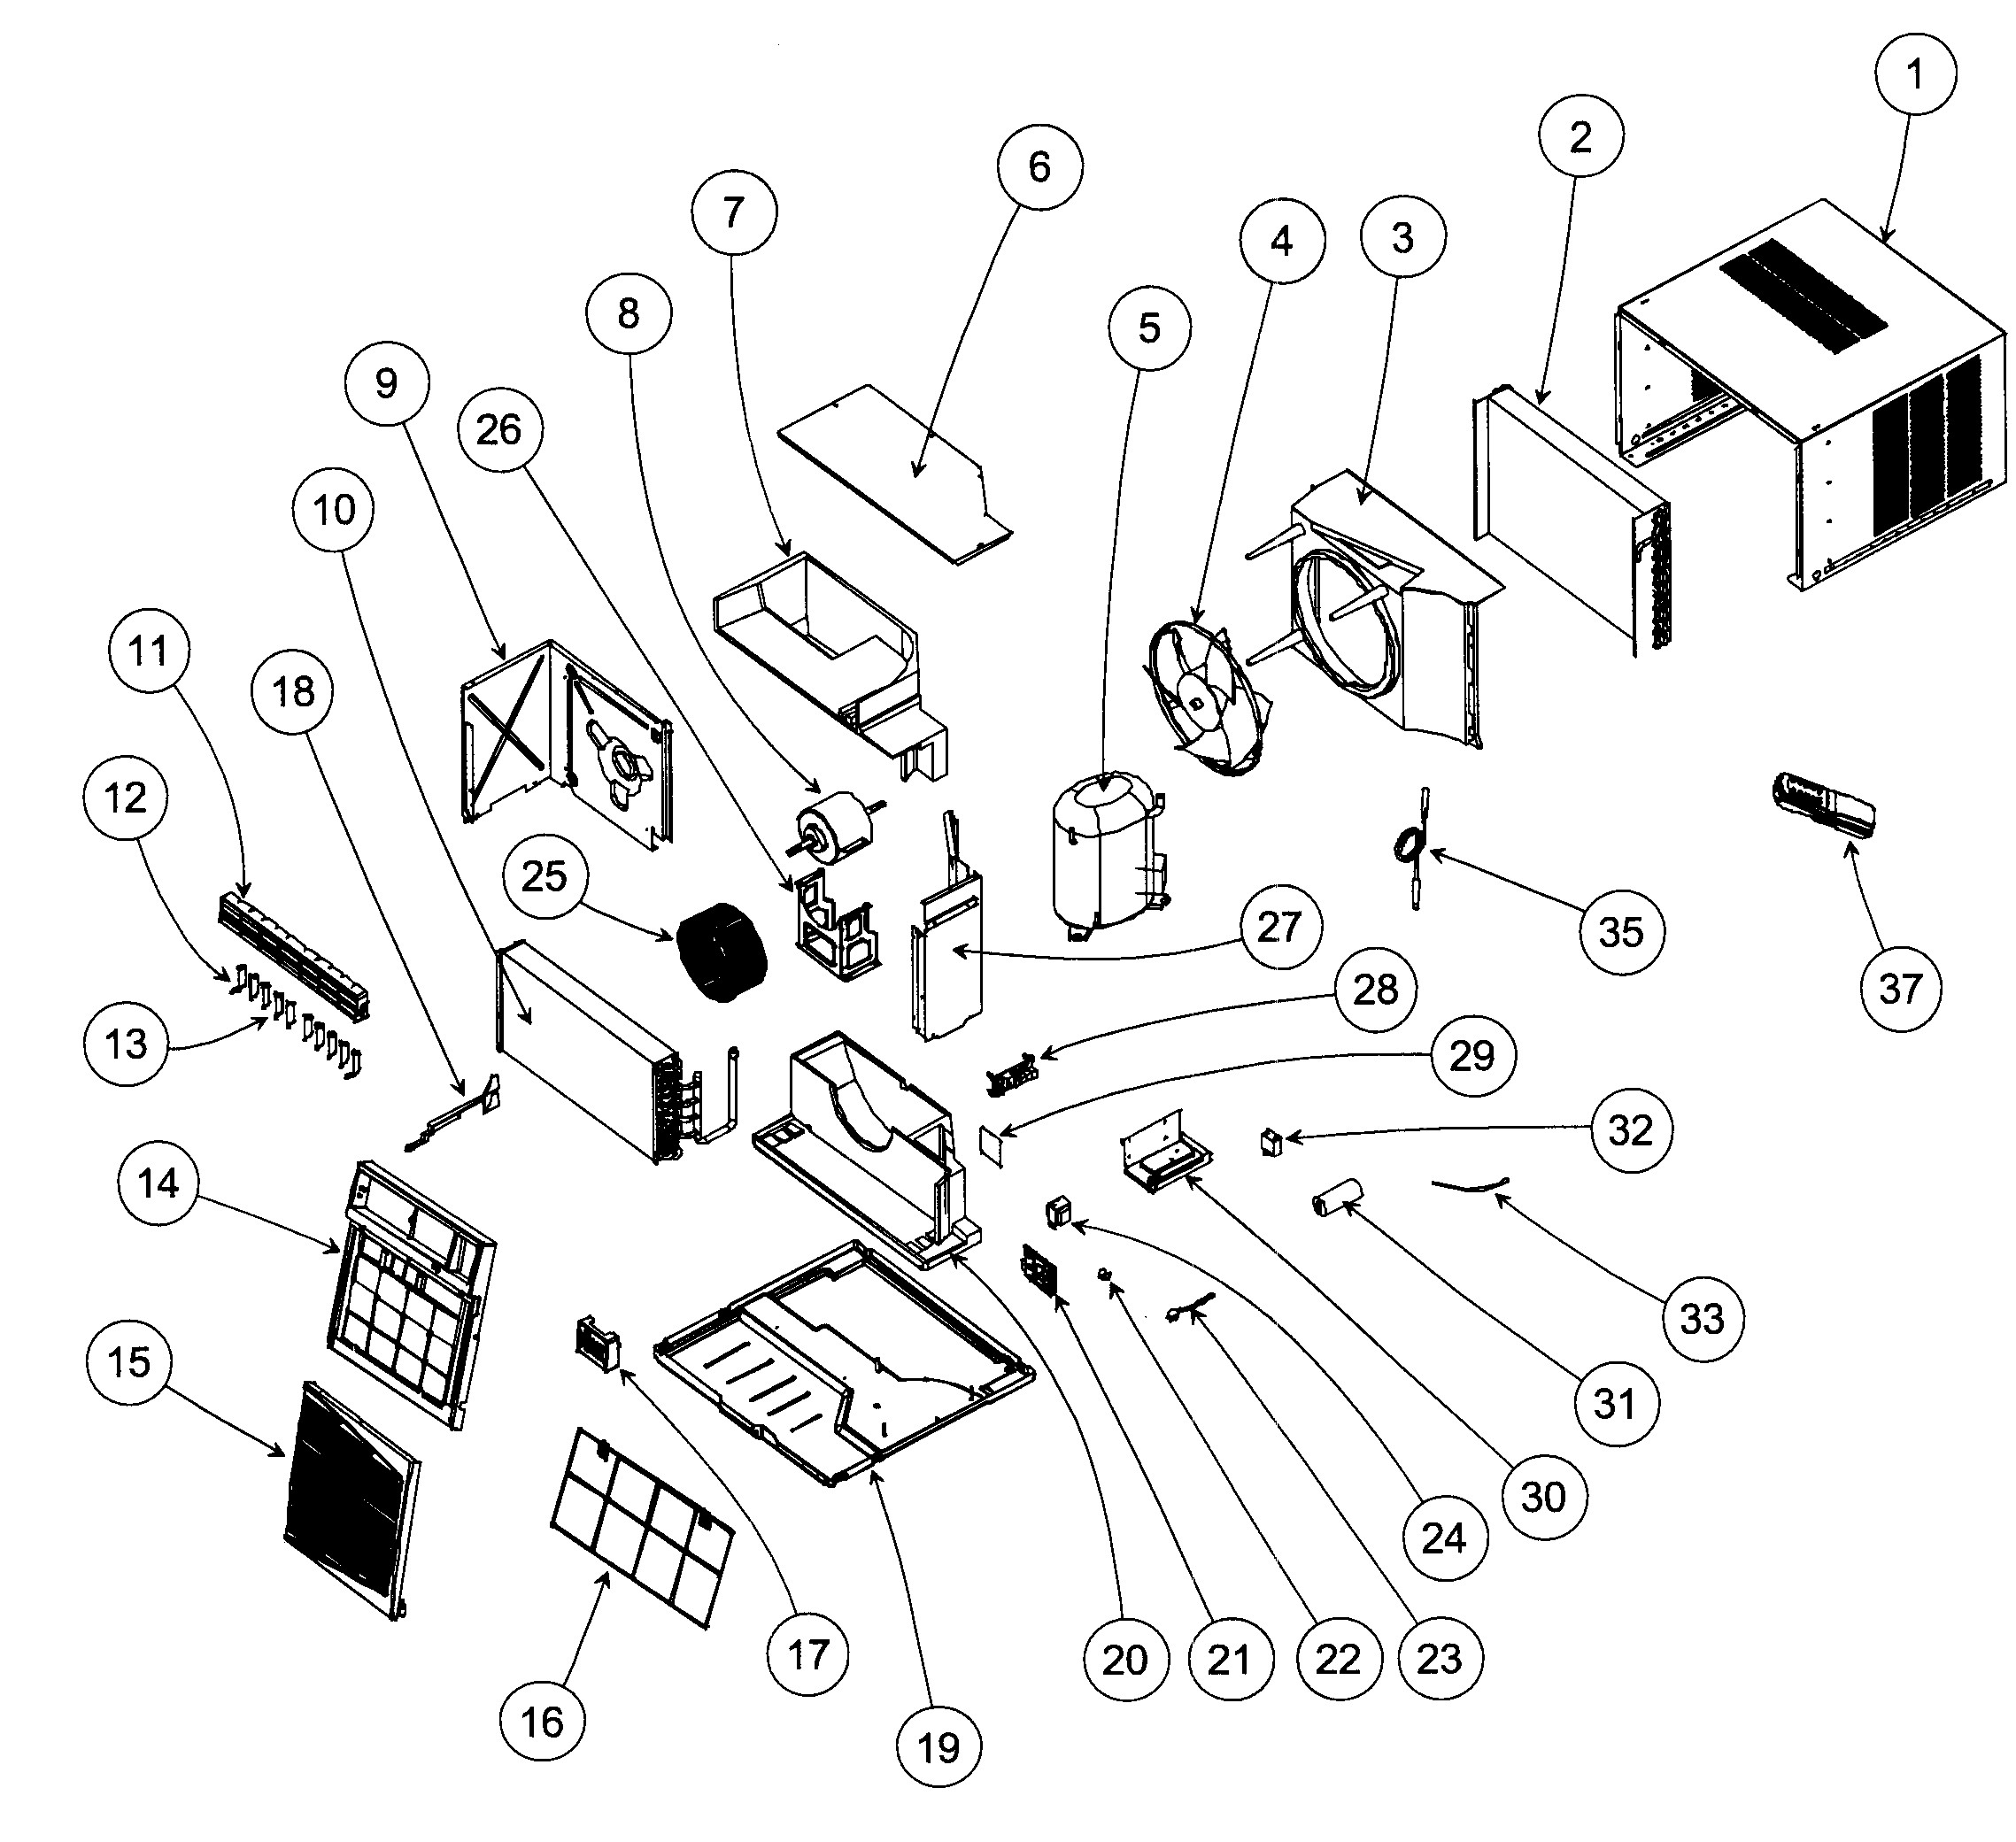 Car Air Conditioner Parts Diagram Looking for Carrier Model Kca P Room Air Conditioner Repair